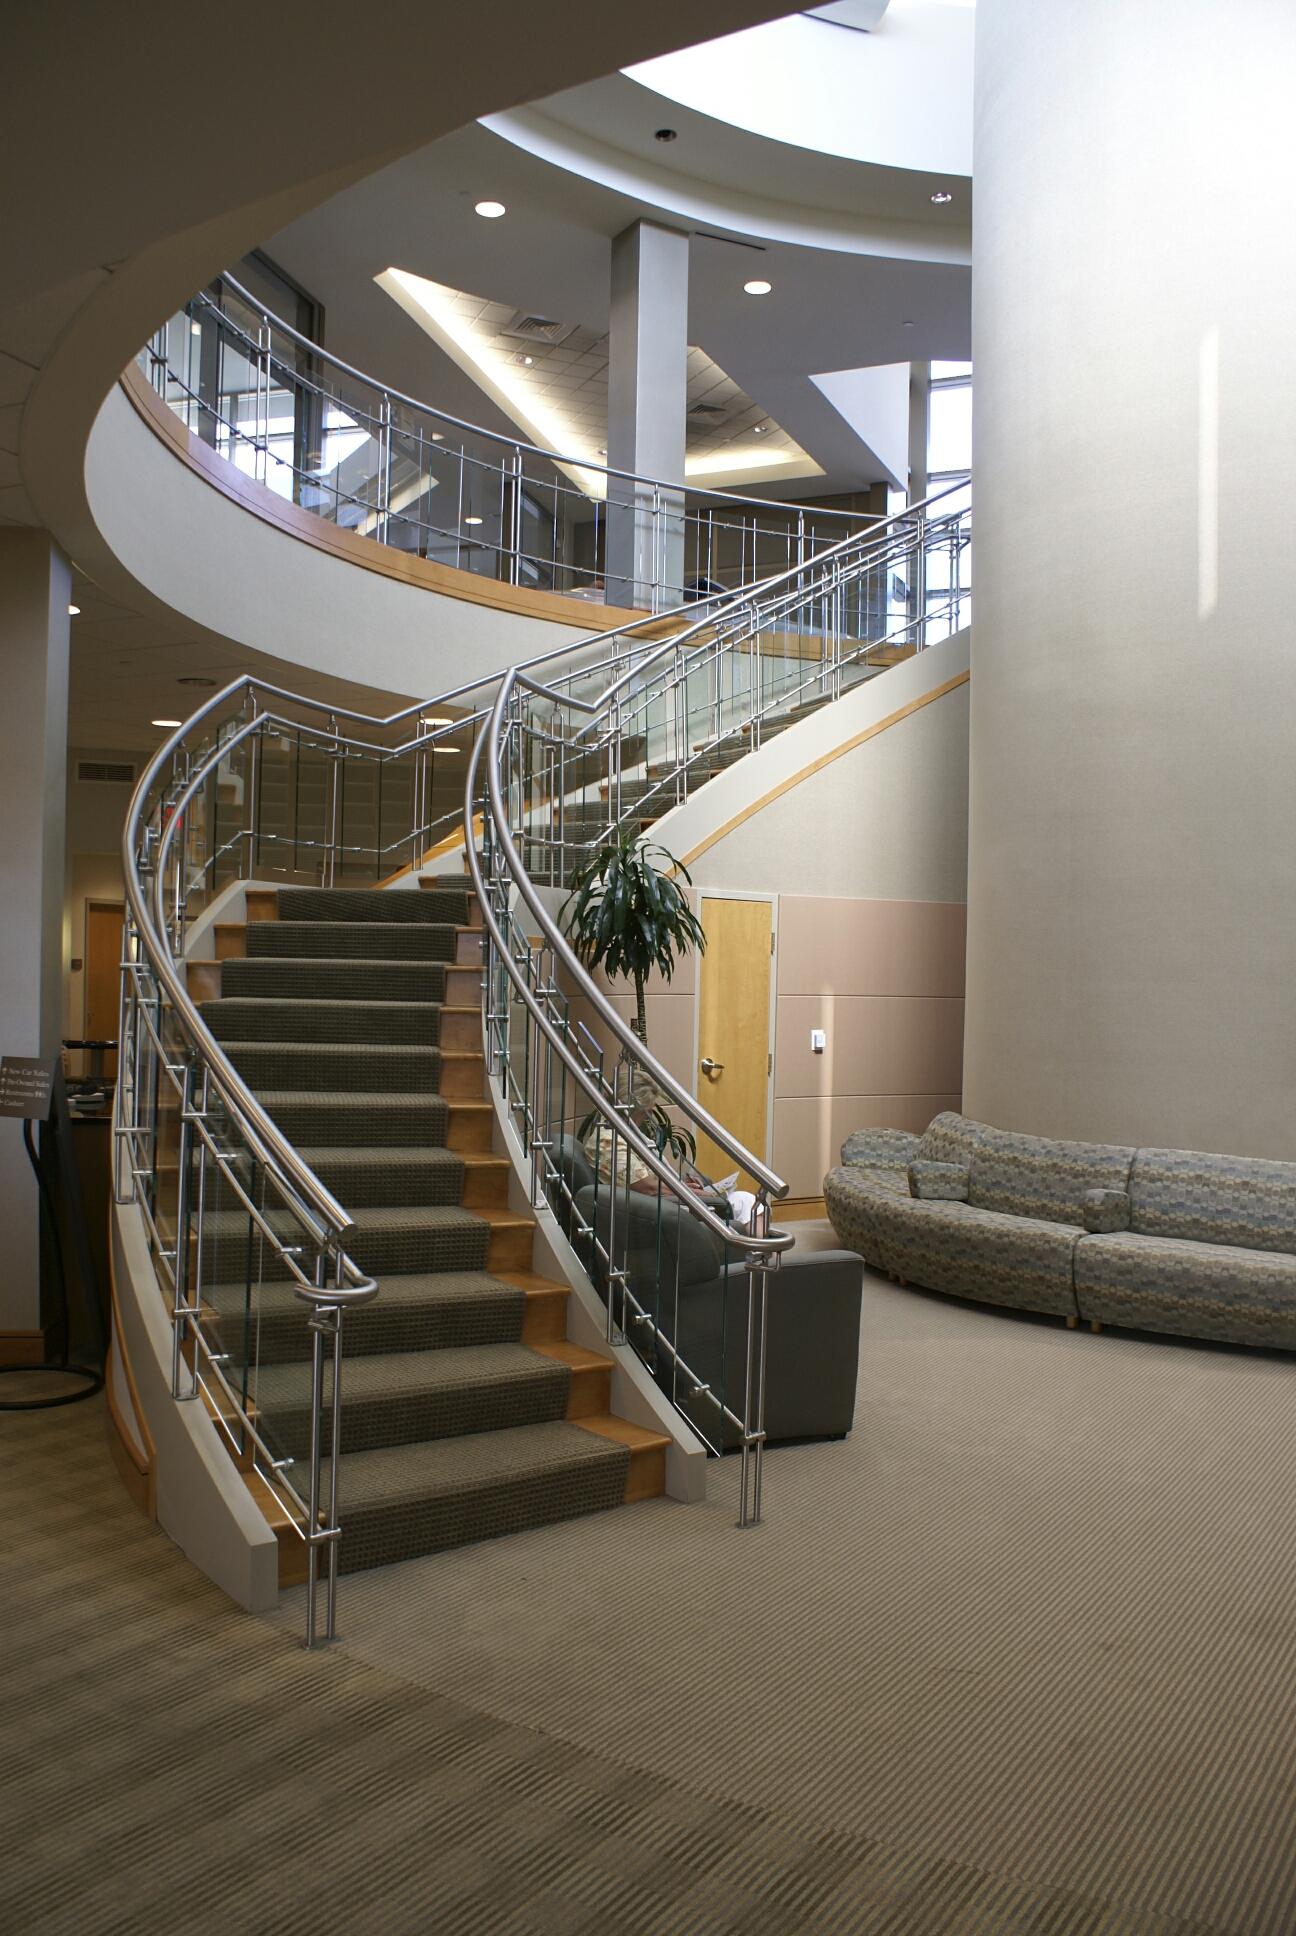 Luxury Ways for Selecting Railings